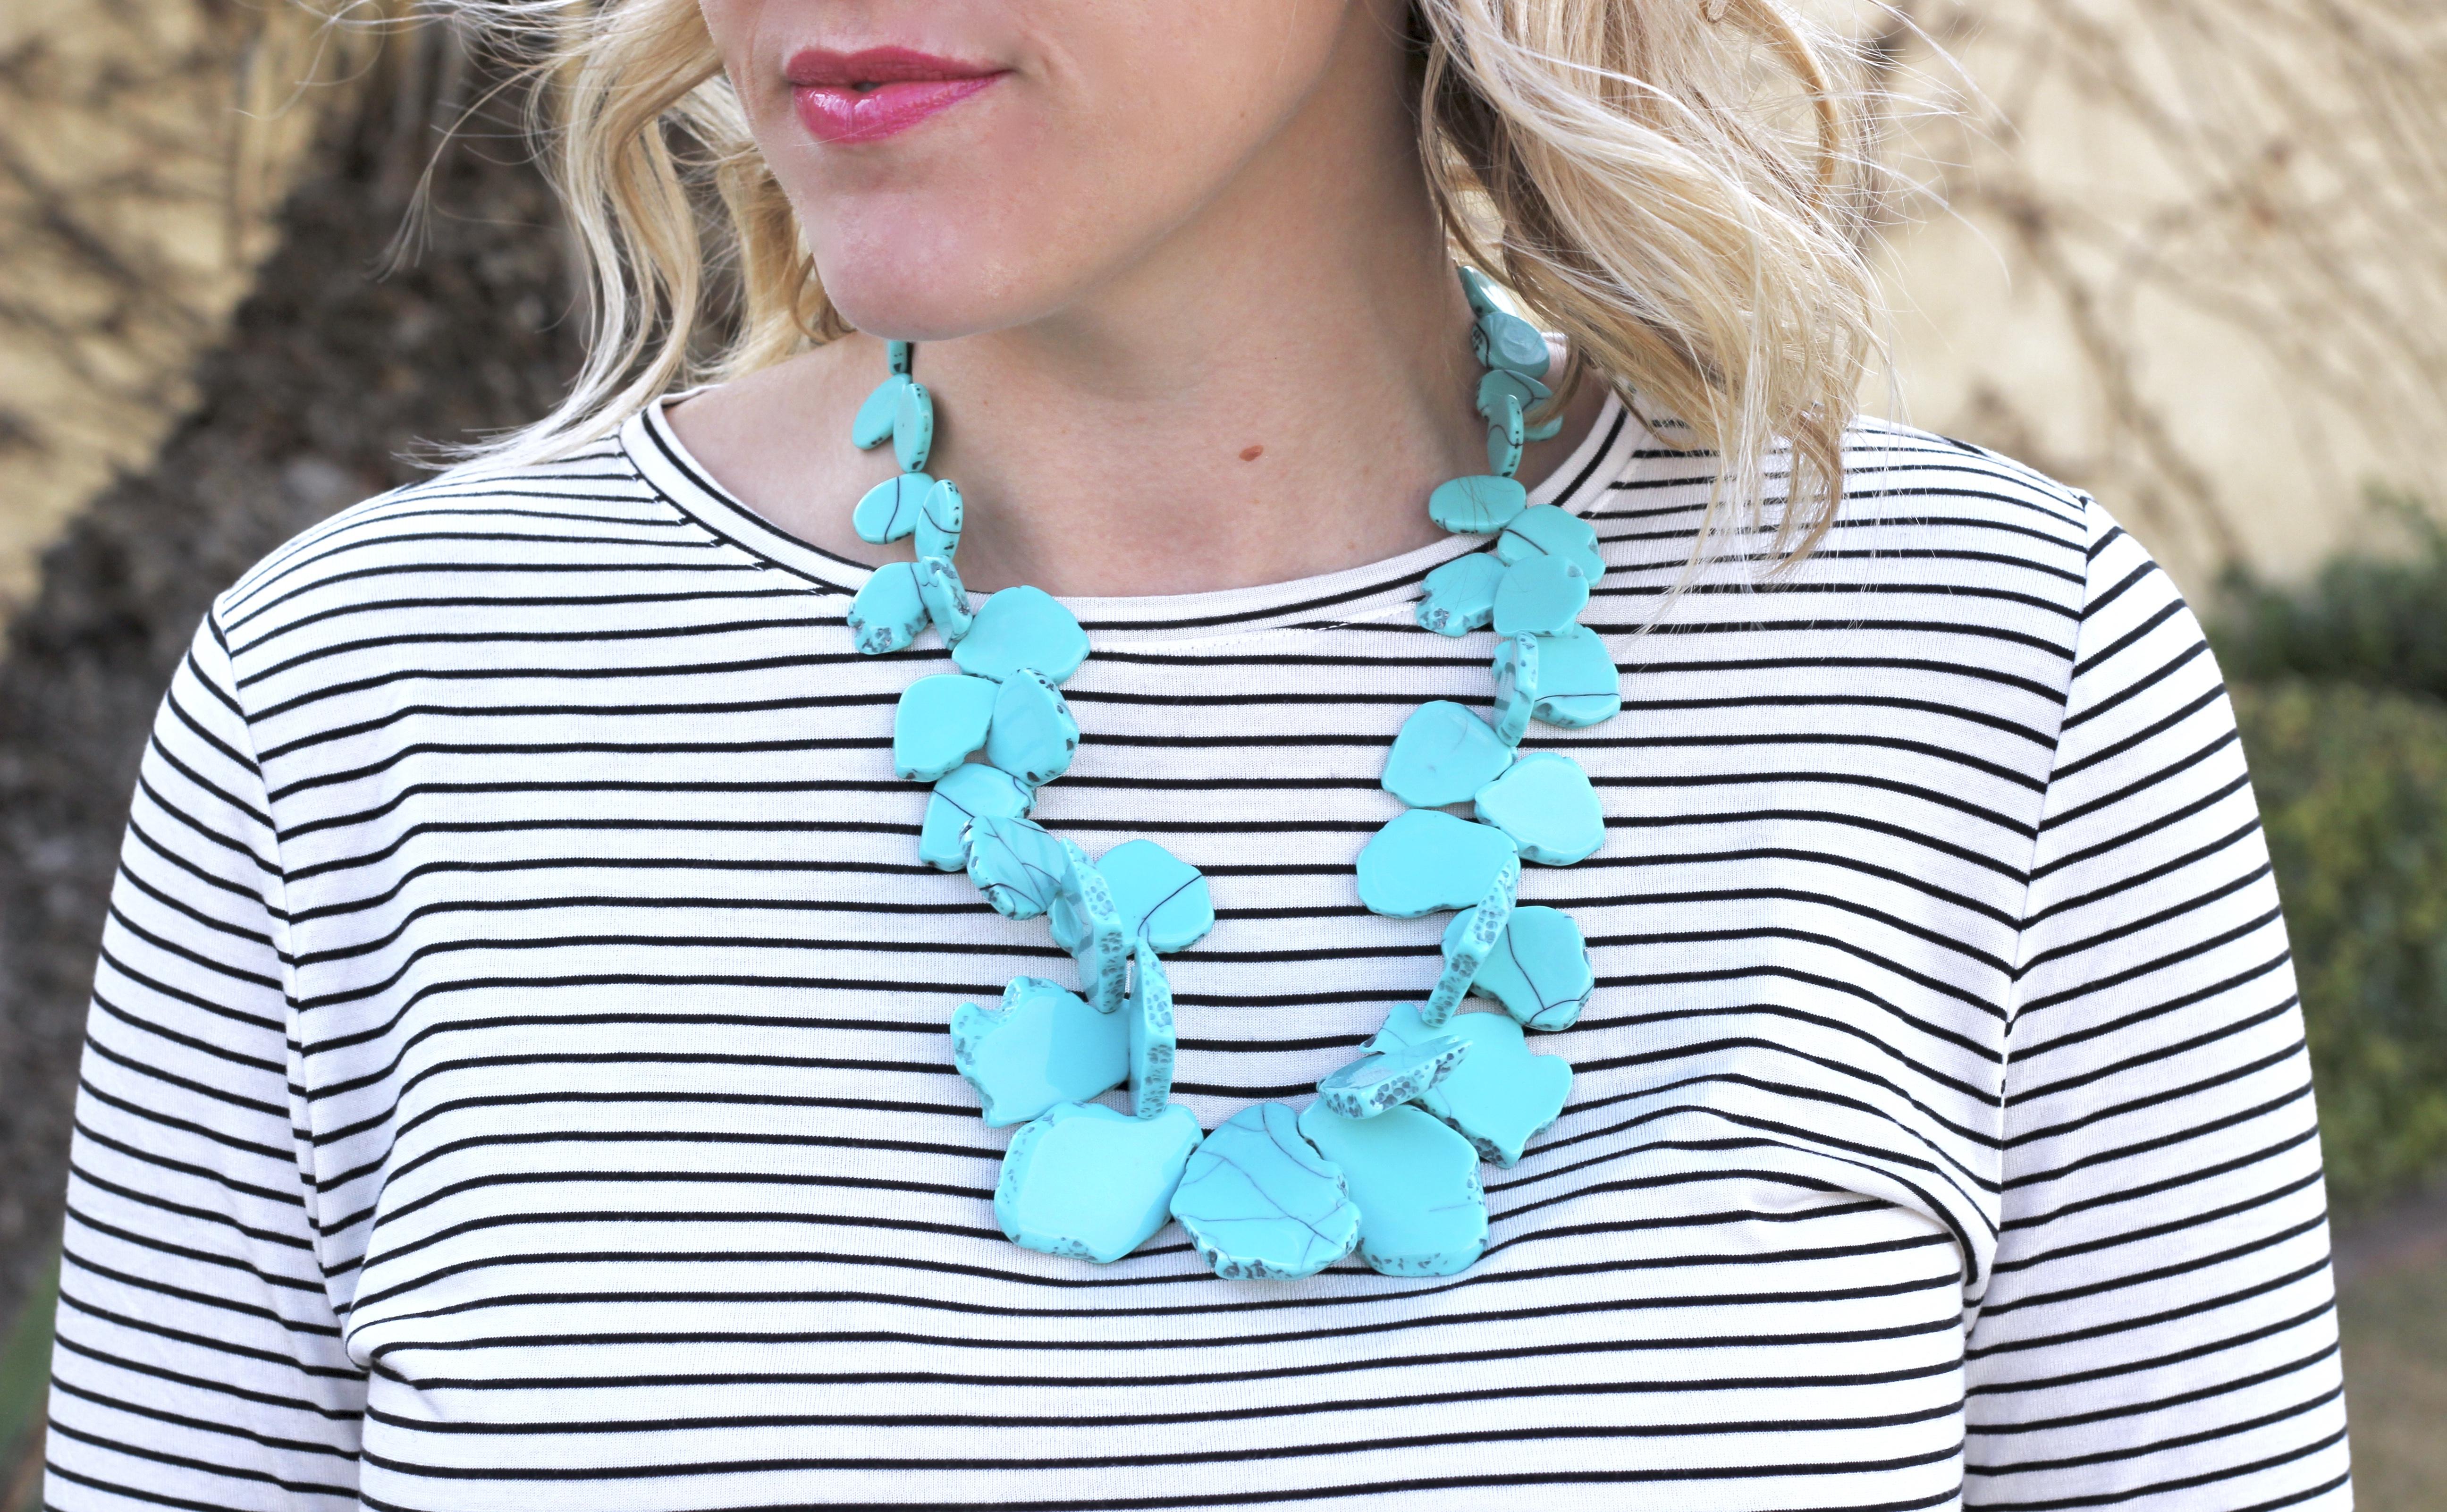 Baublebar turquoise seaglass bib necklace